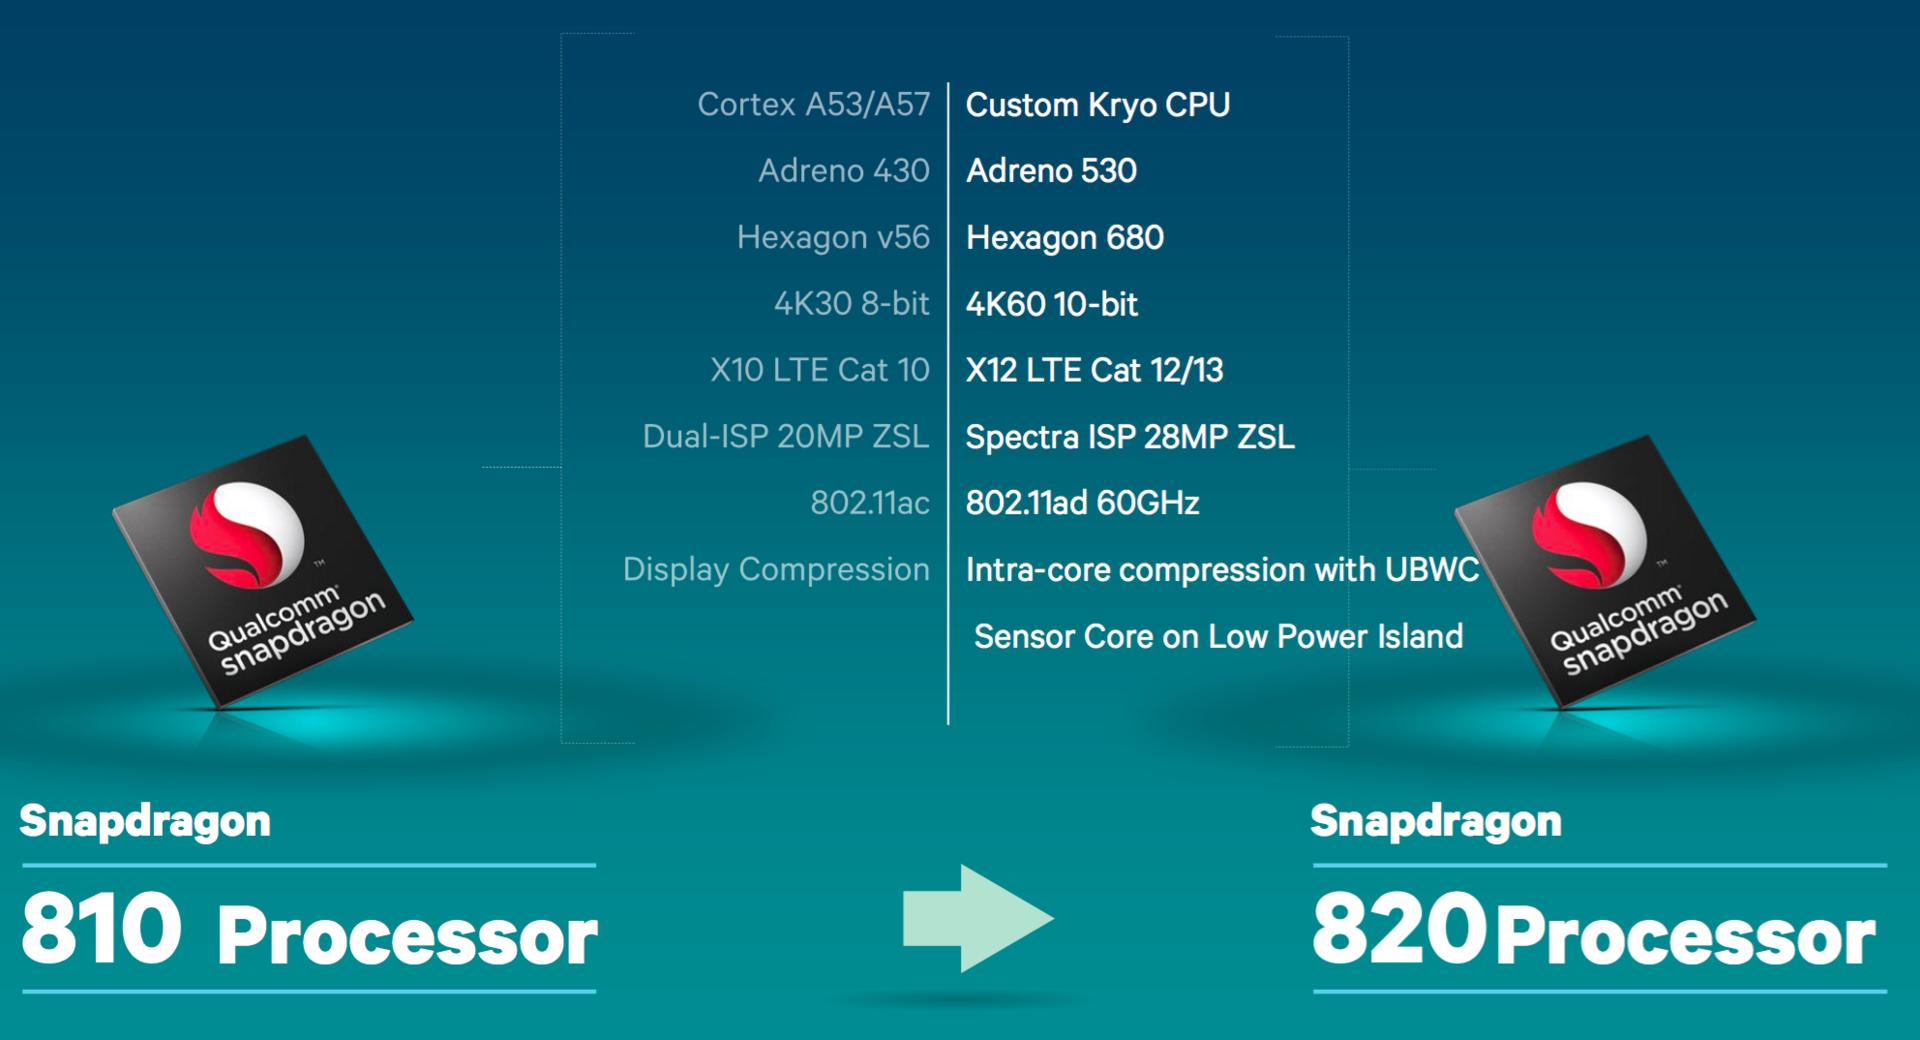 Qualcomm Snapdragon 820 Msm8996 Soc Notebookcheck Net Tech